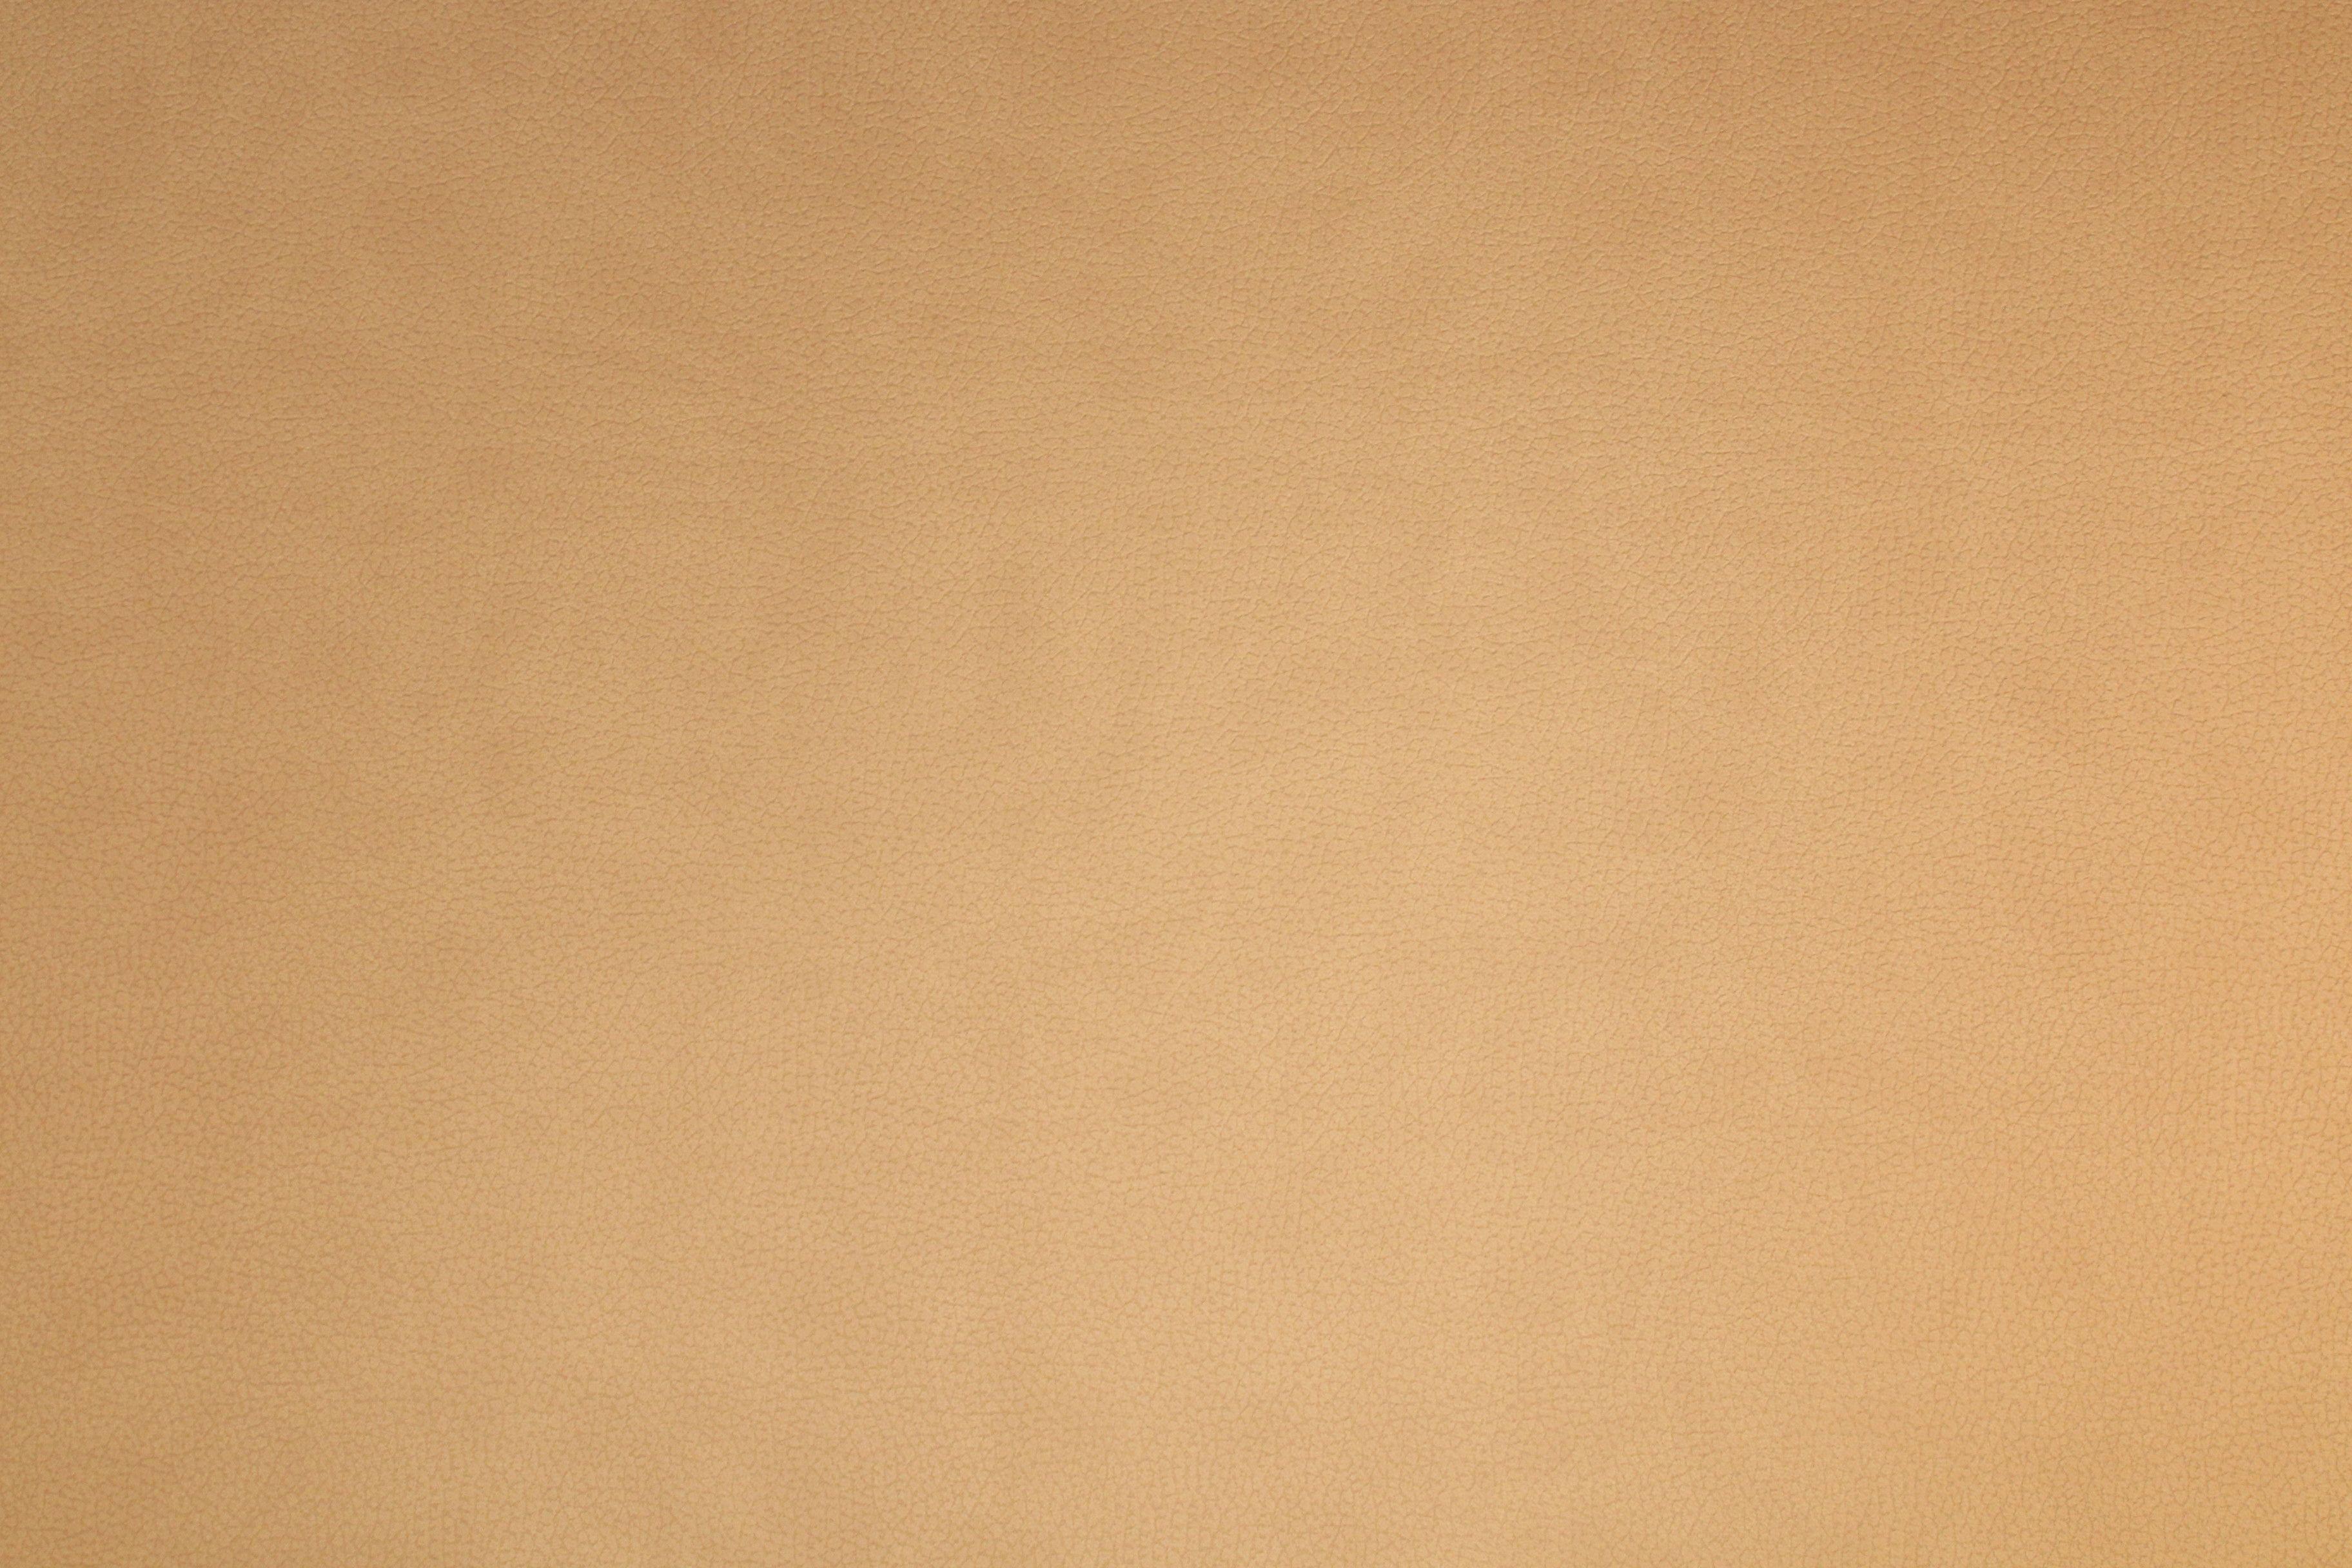 Fond beige texture cuir background mioche studio matériel